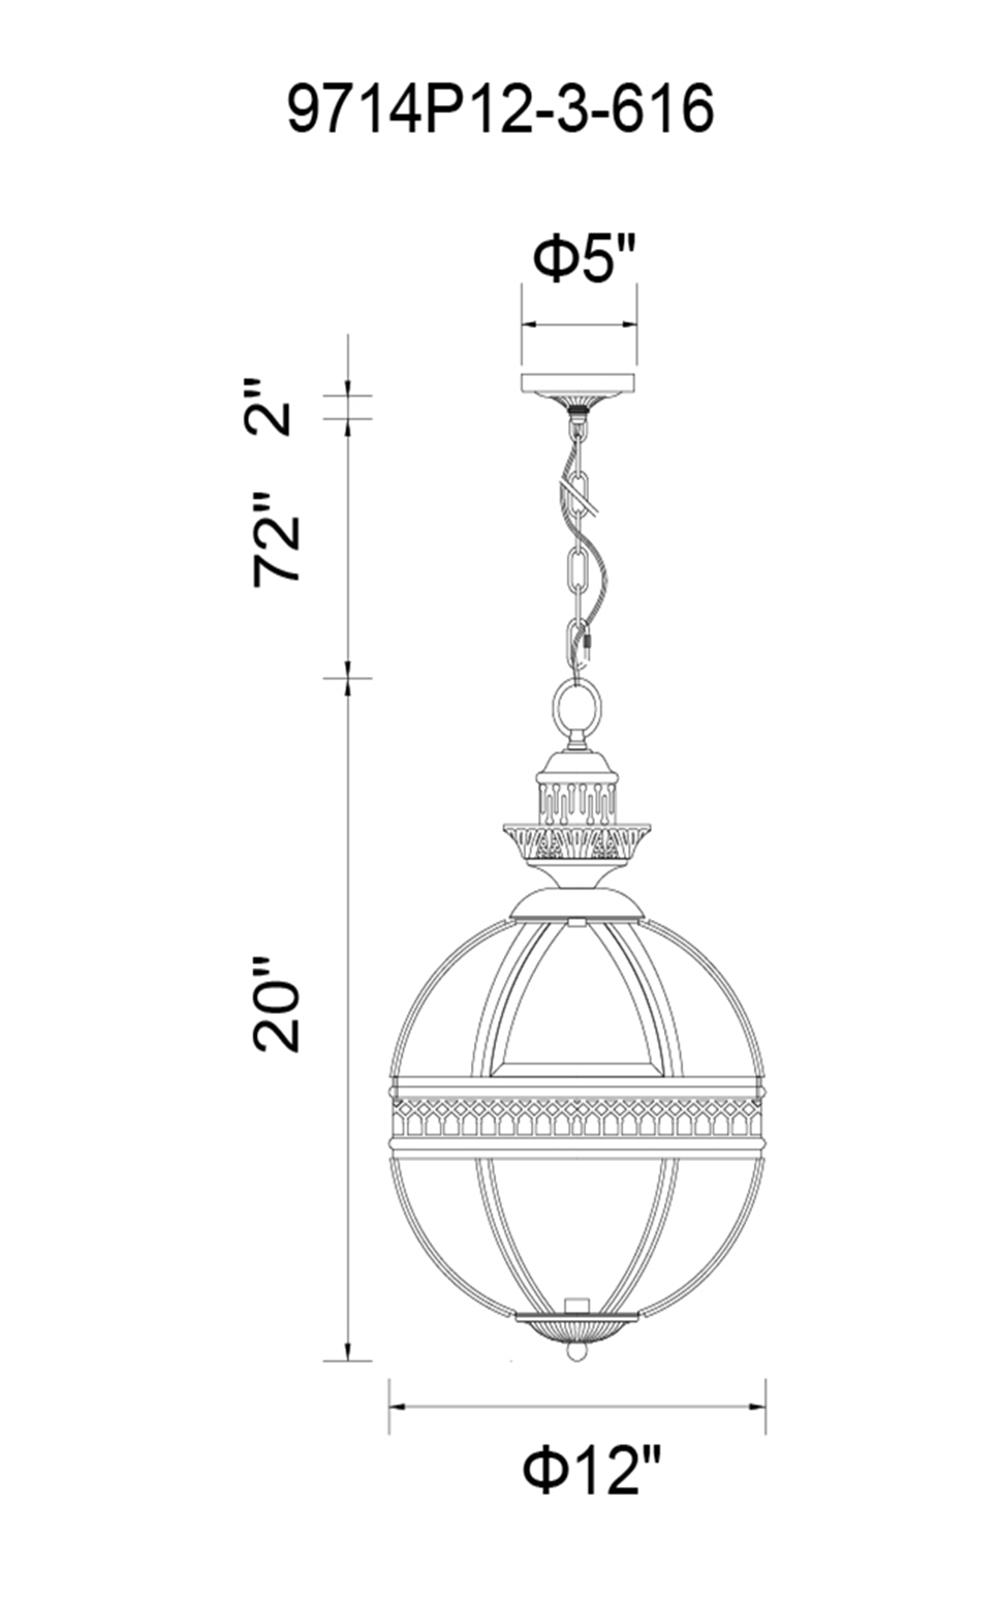 CWI Lighting Lune 3 Light Up Mini Pendant With Bronze Finish Model: 9714P12-3-616 Line Drawing